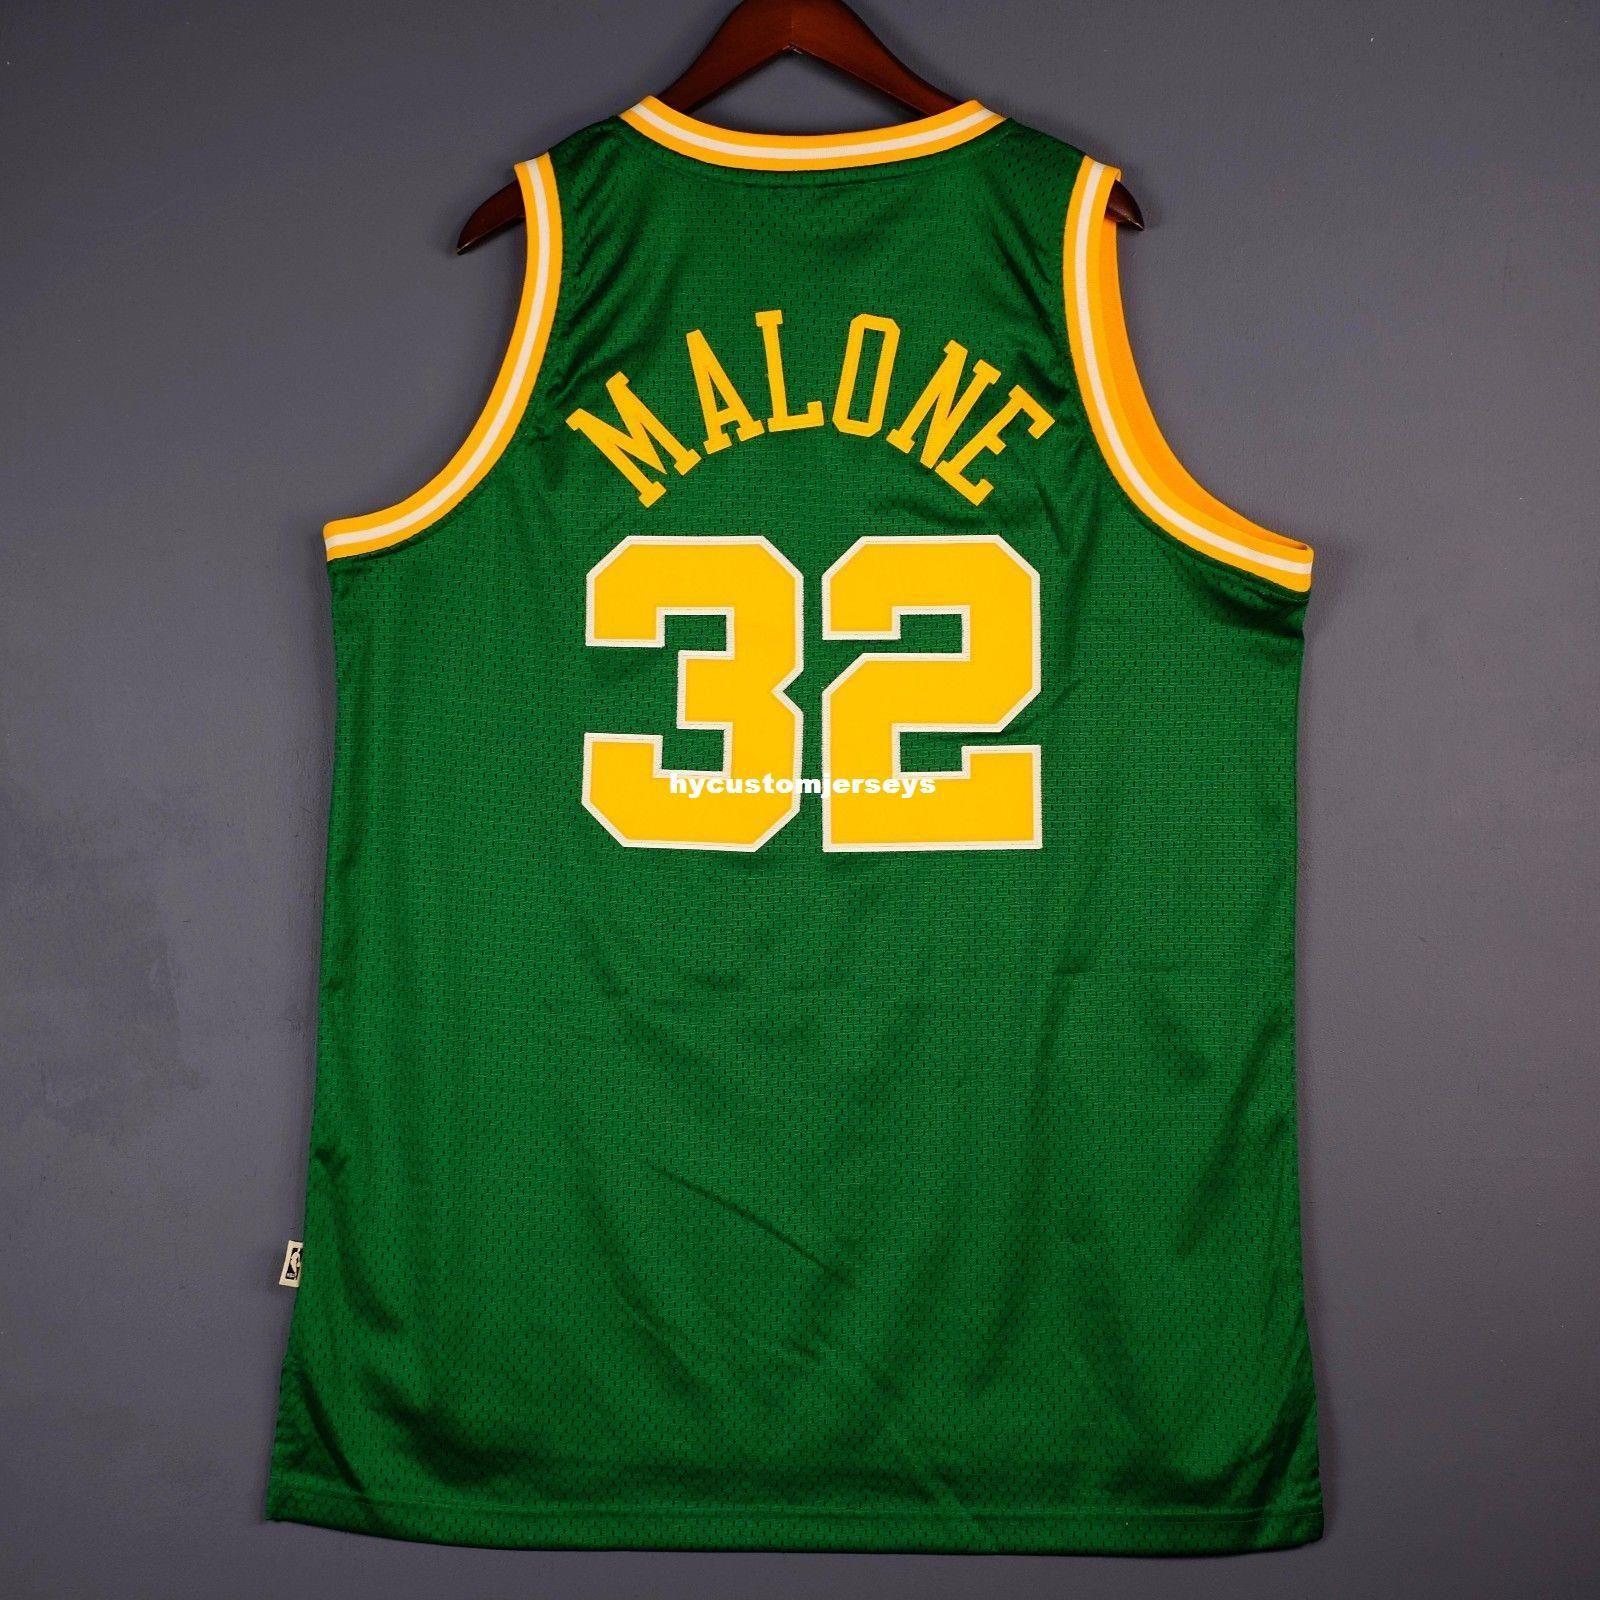 100% genähte Karl Malone # 32 Soul HWC grün genähte Jersey Herren Weste Größe XS-6XL Genähte Basketball Trikots Ncaa